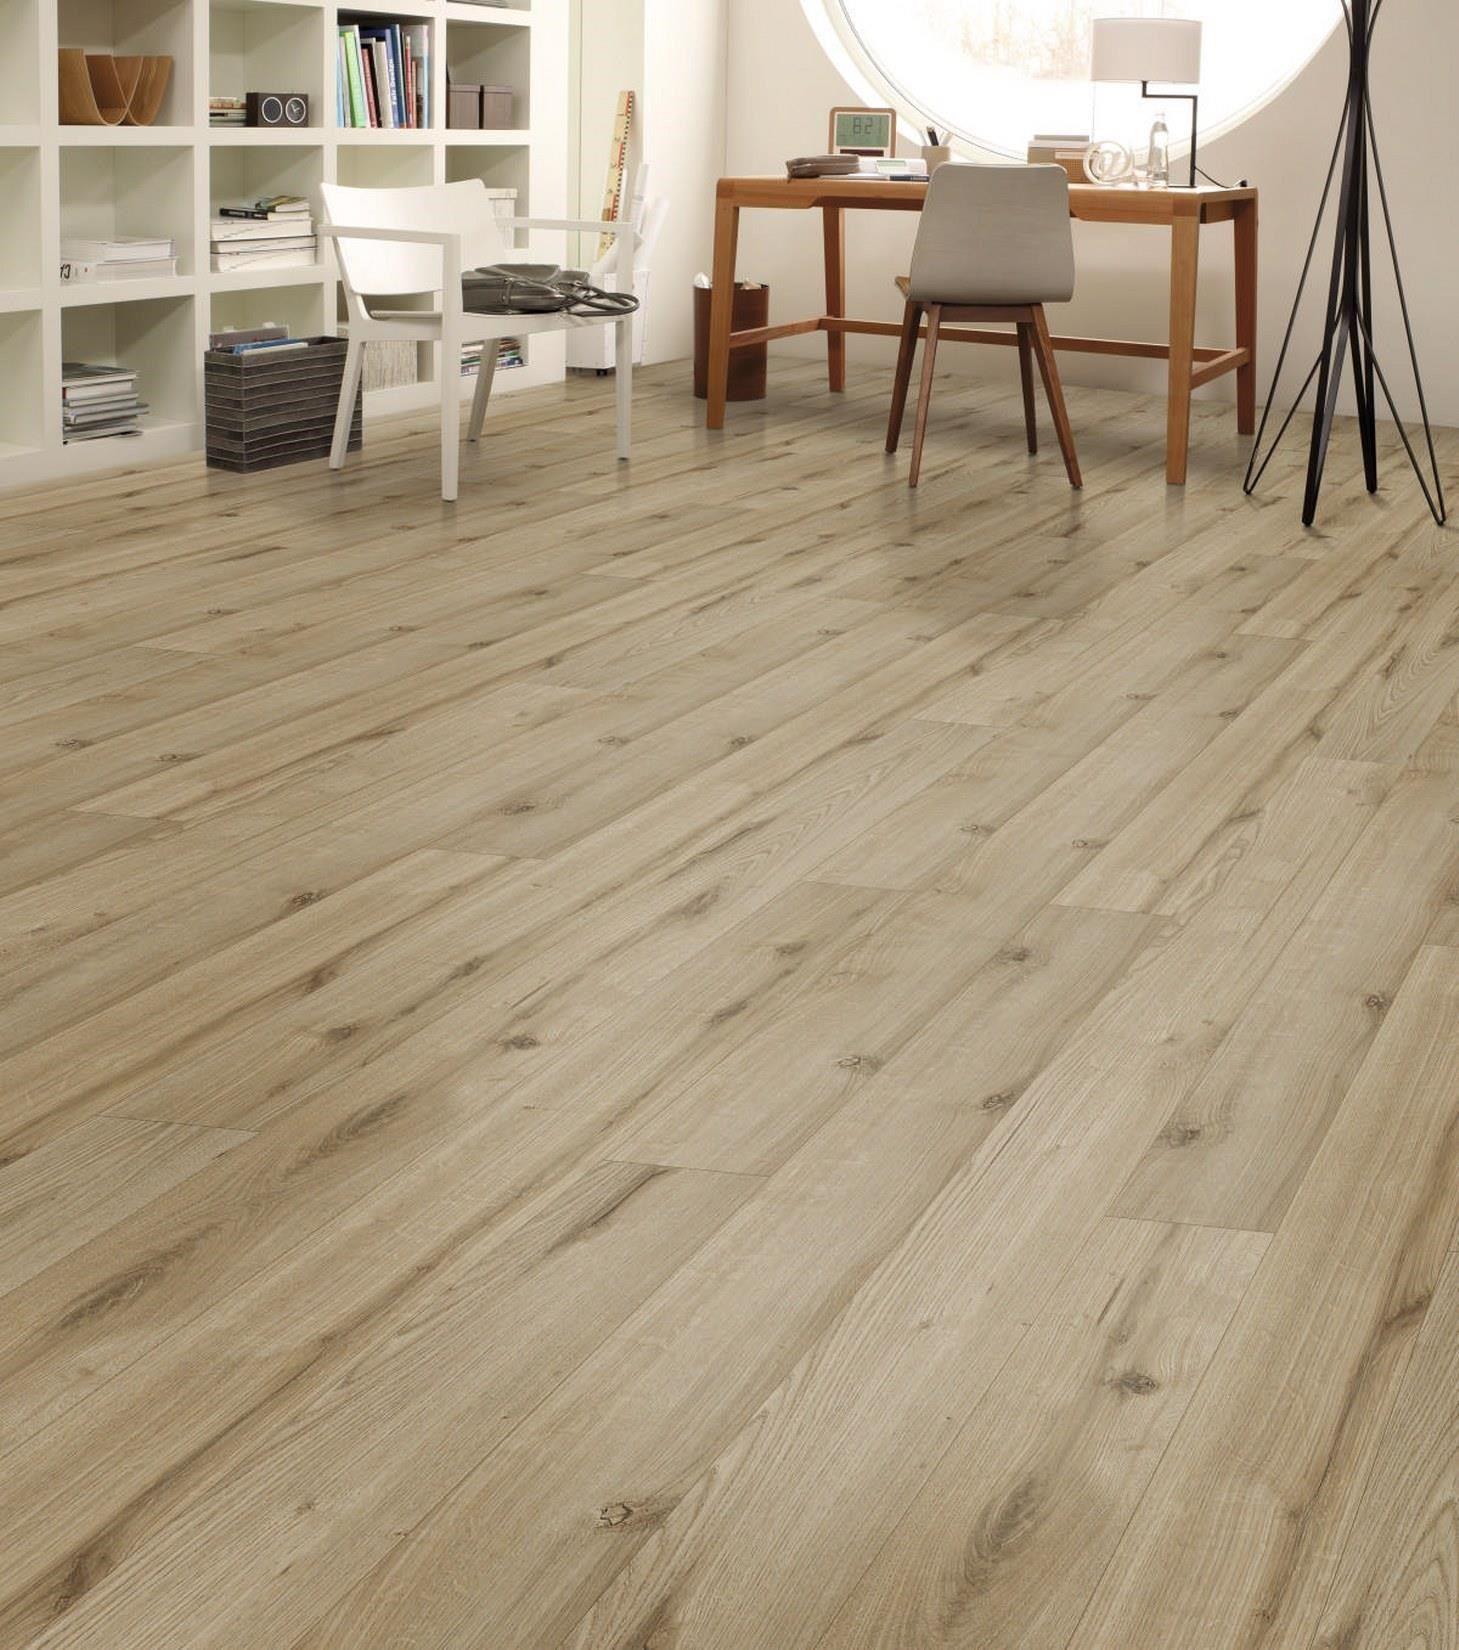 Harðparket Húsasmiðjan Flooring, Wood laminate